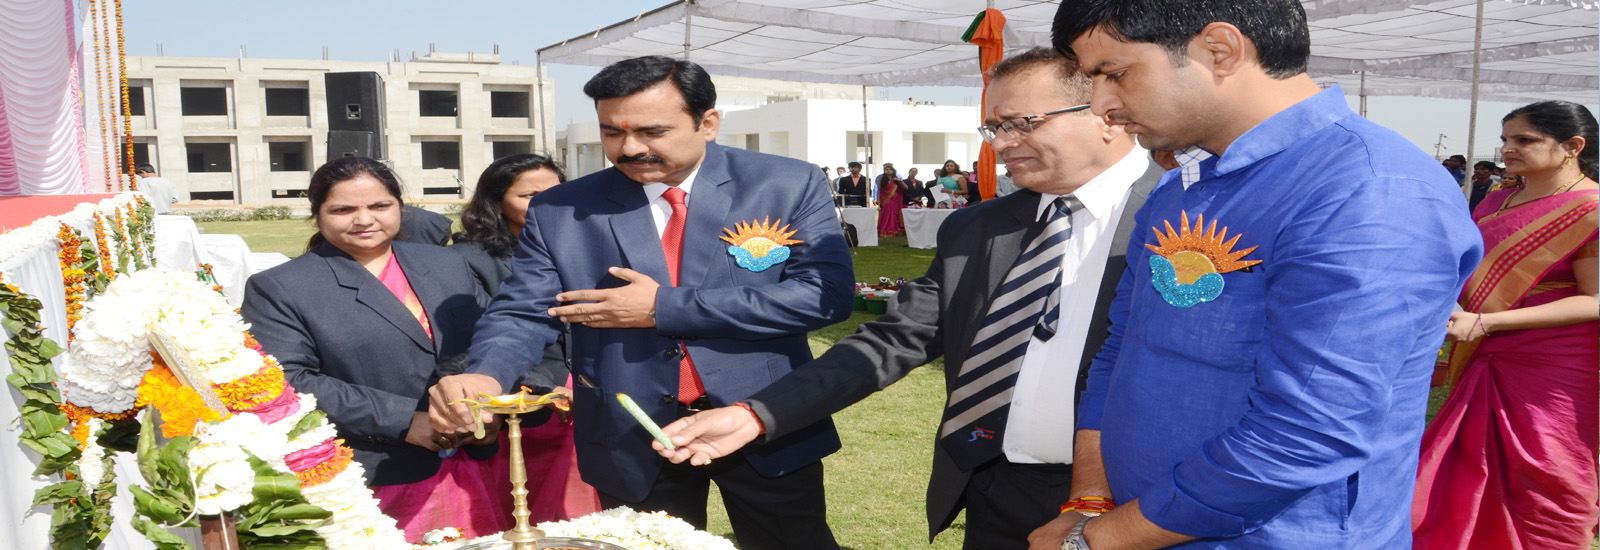 S S  Jain Subodh College of Global Excellence, Sitapura Jaipur